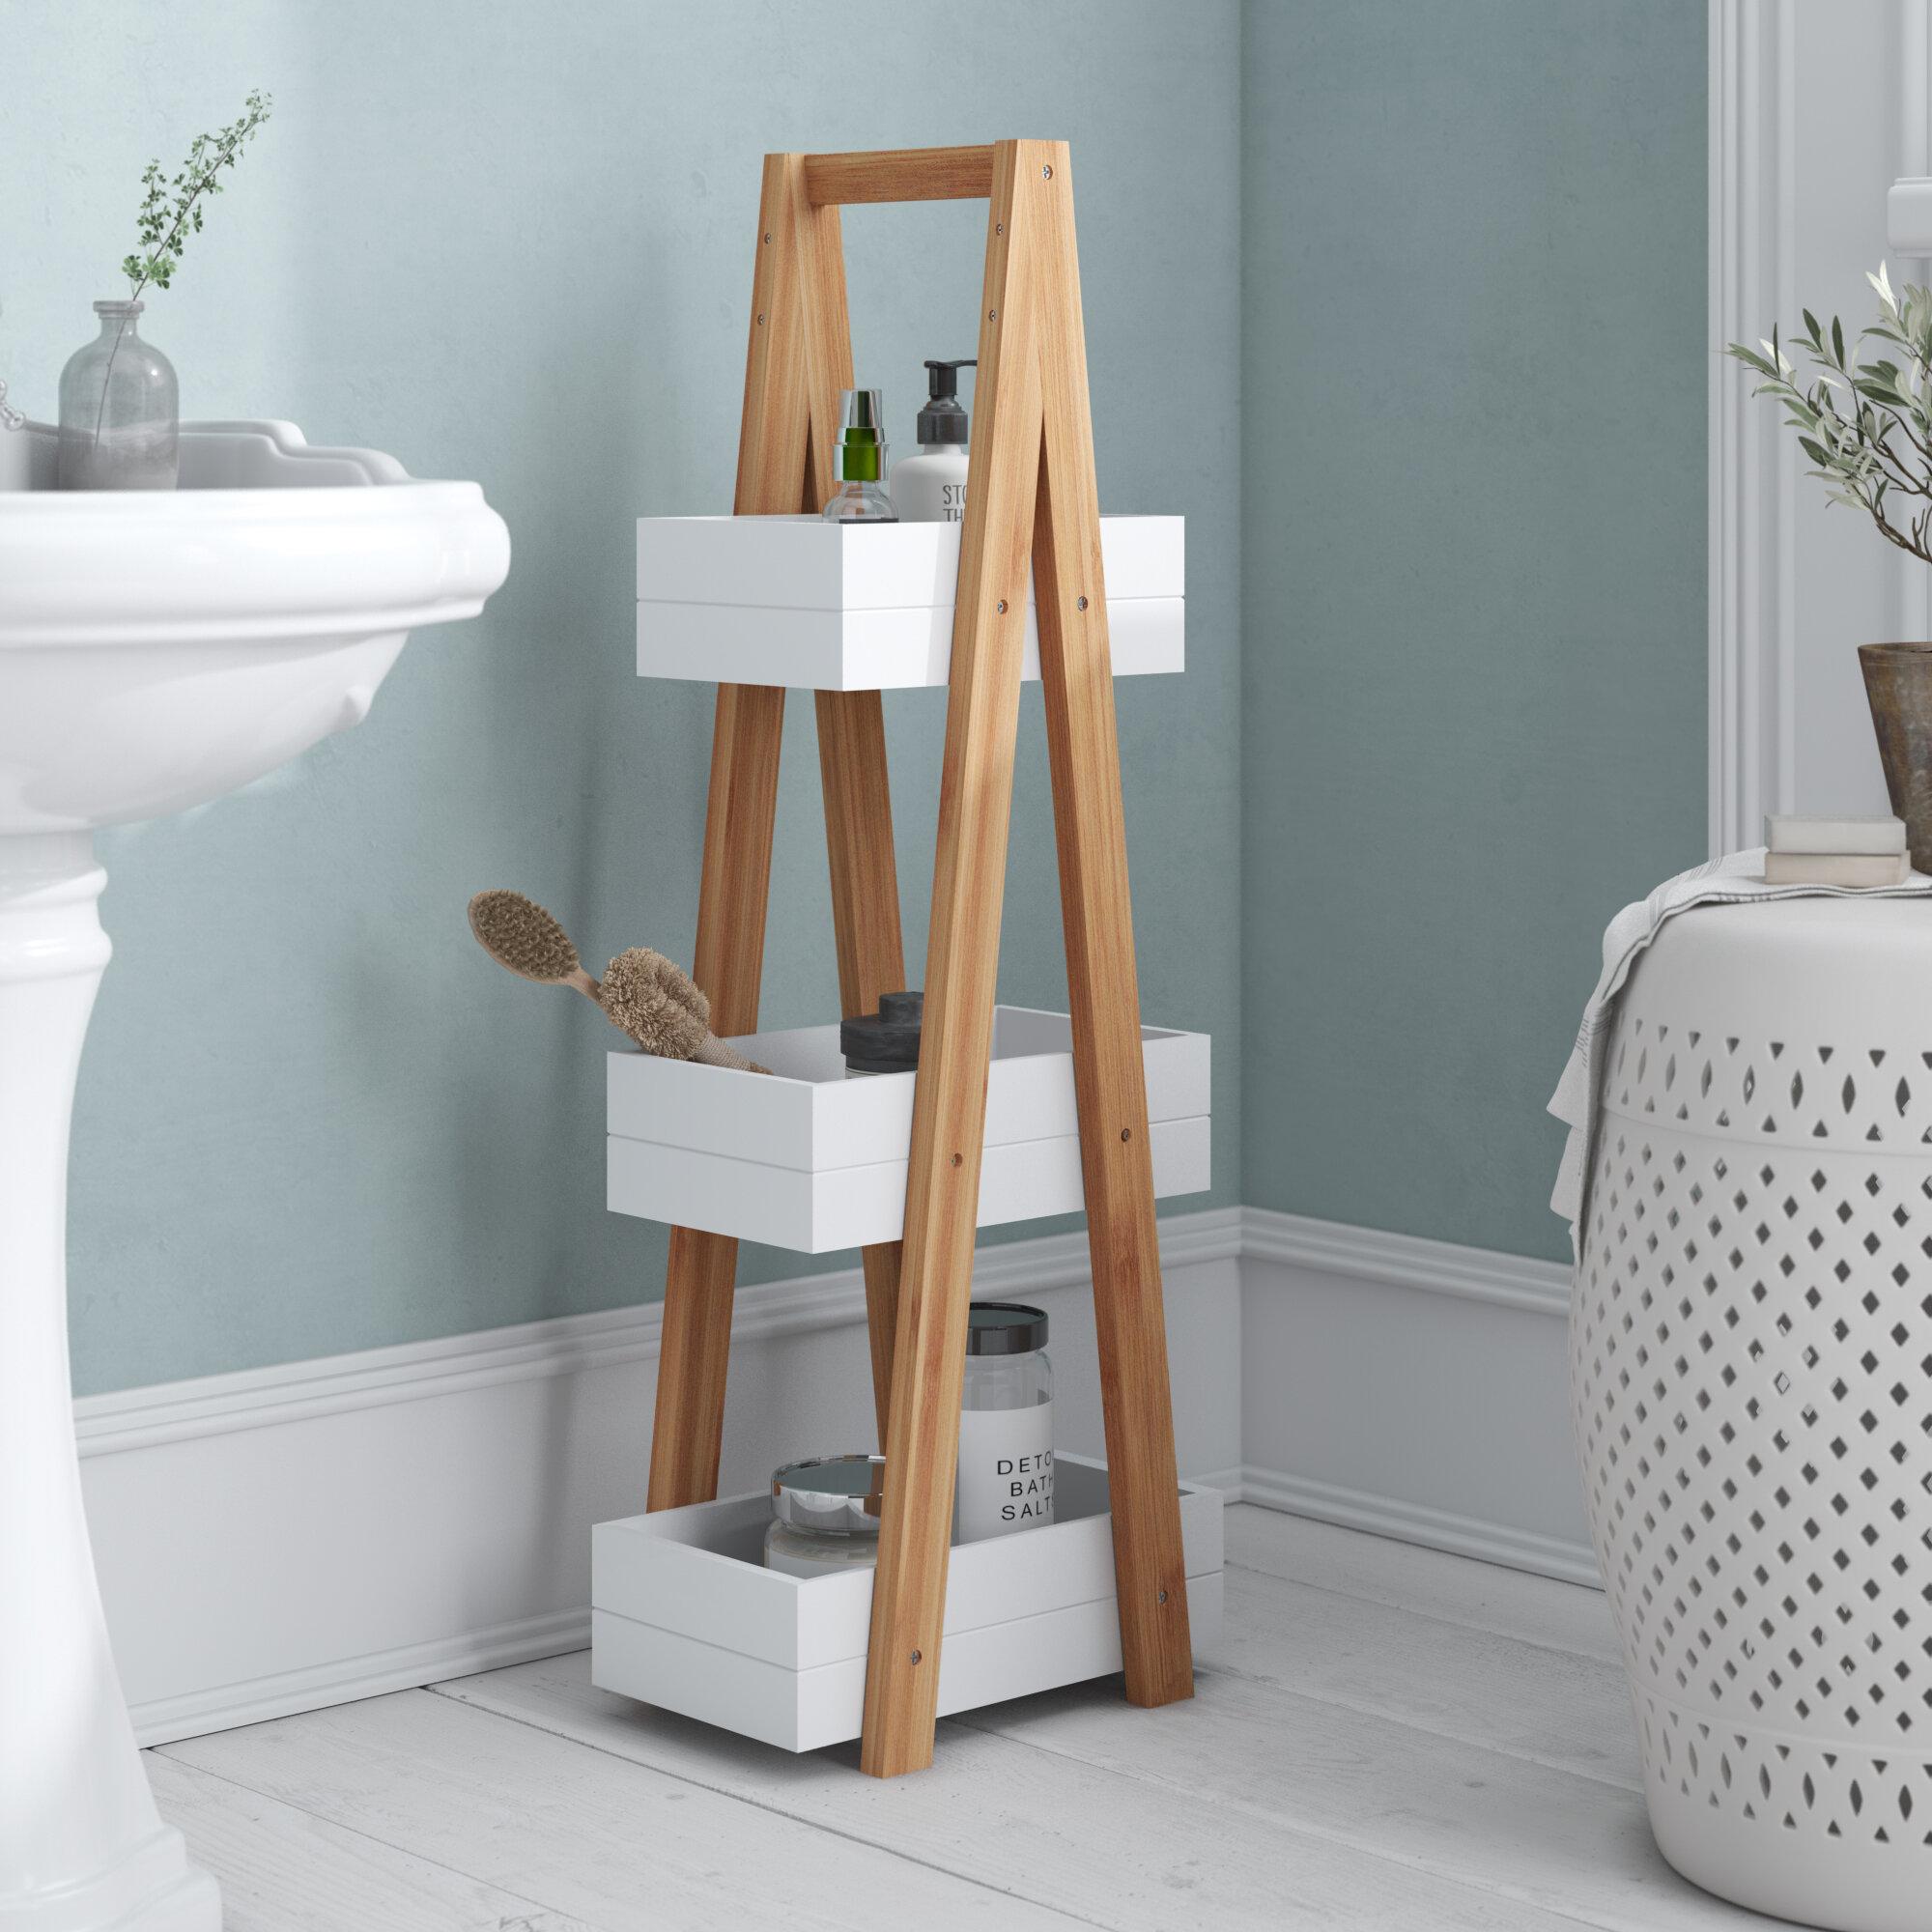 Wayfair & Wolter 30 x 81cm Bathroom Shelf